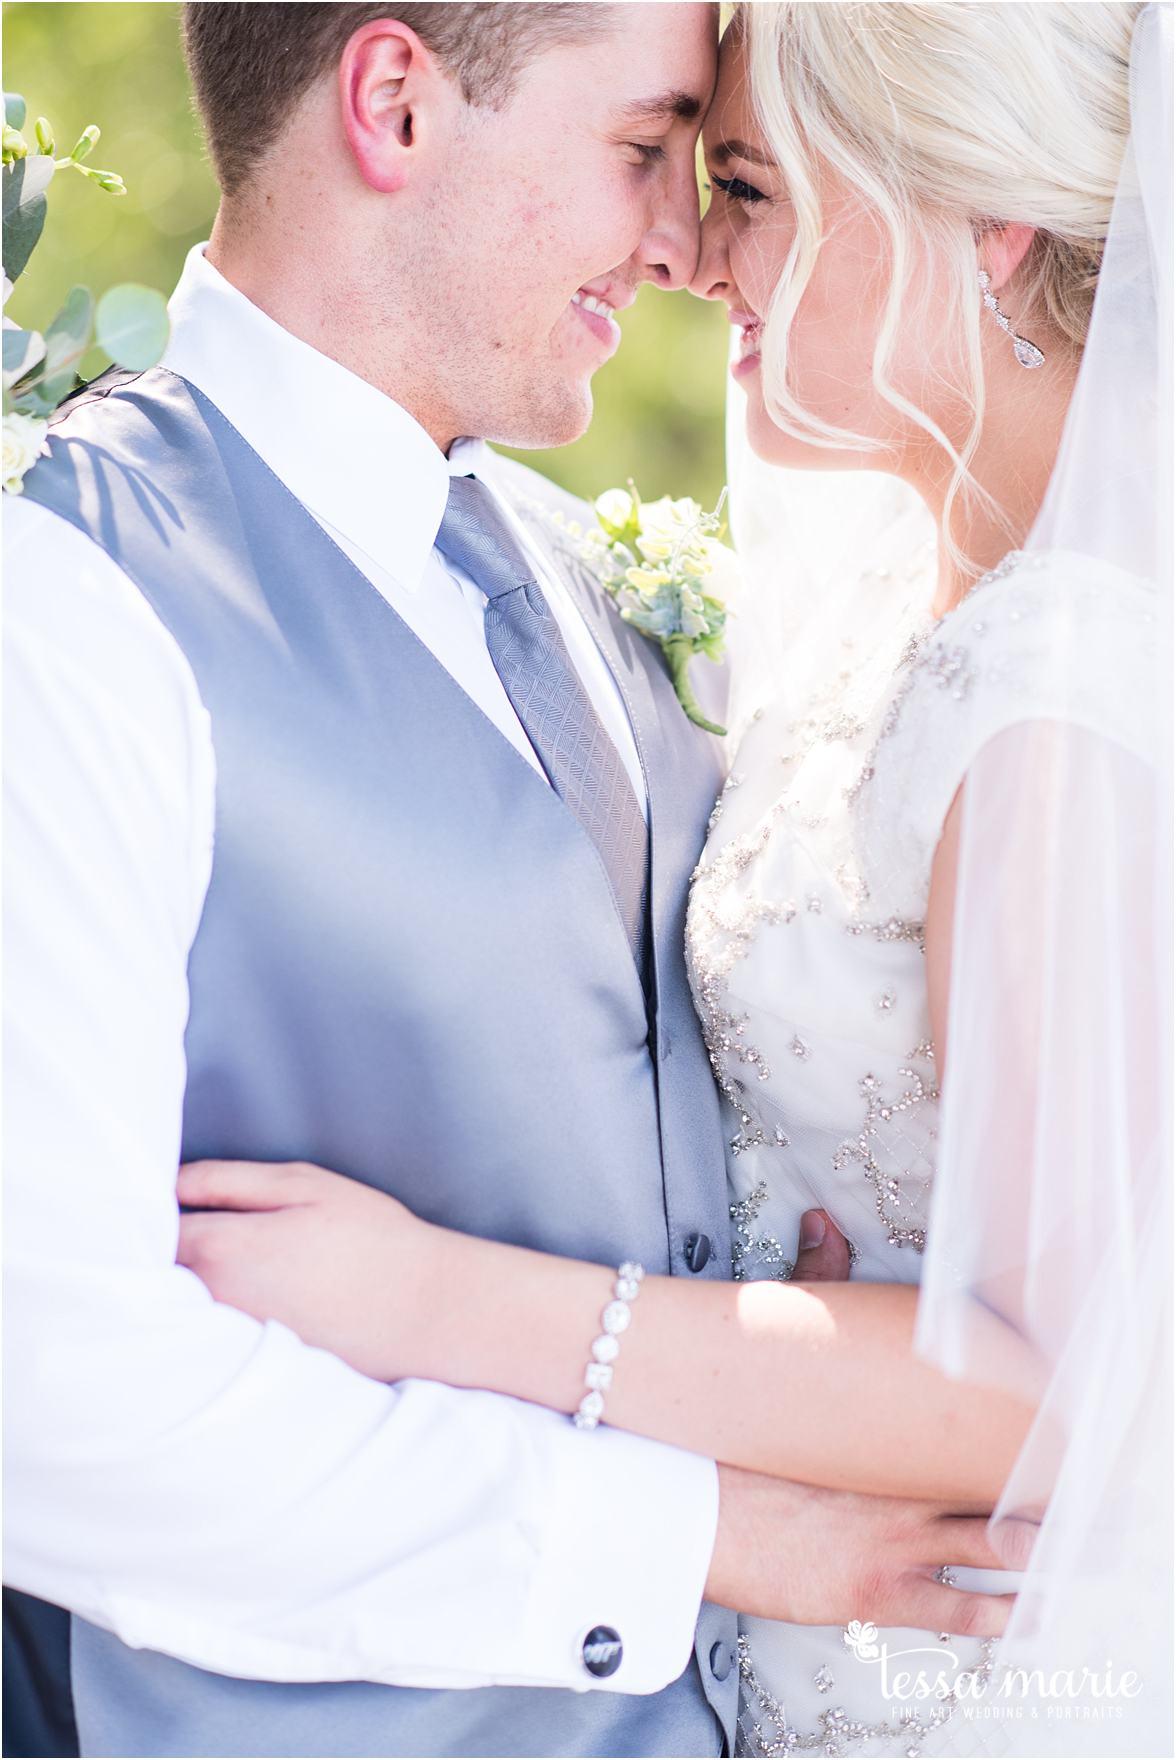 lake_lanier_wedding_summer_pictures_legacy_moments_family_candid_atlantas_best_wedding_photographer_tessa_marie_weddings_lake_lanier_bride_out_door_wedding_0133